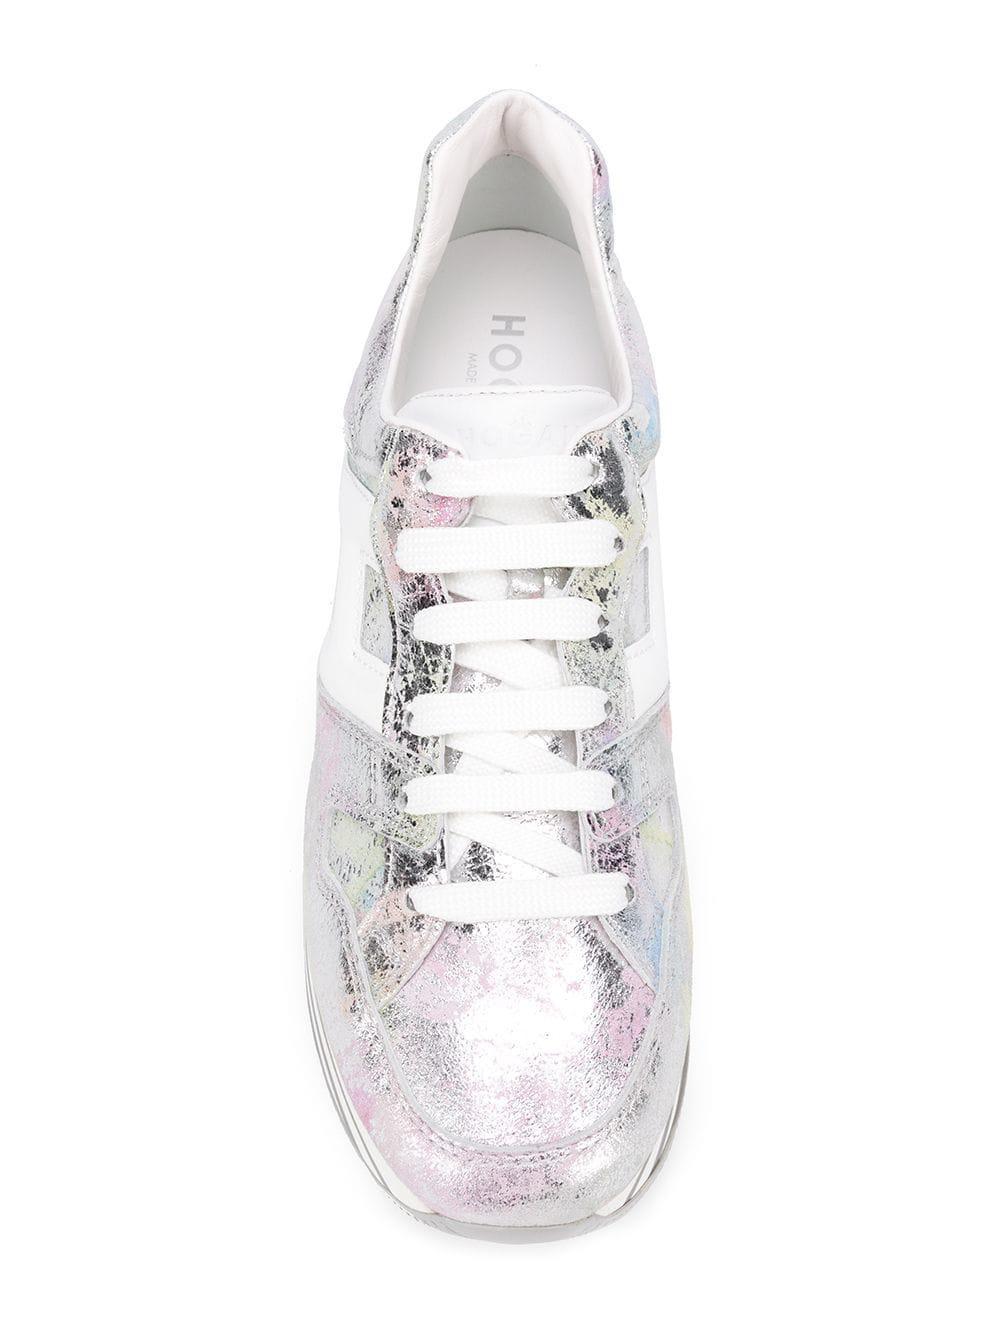 Hogan Leather Maxi H22 Platform Sneakers in Silver (Metallic) - Lyst